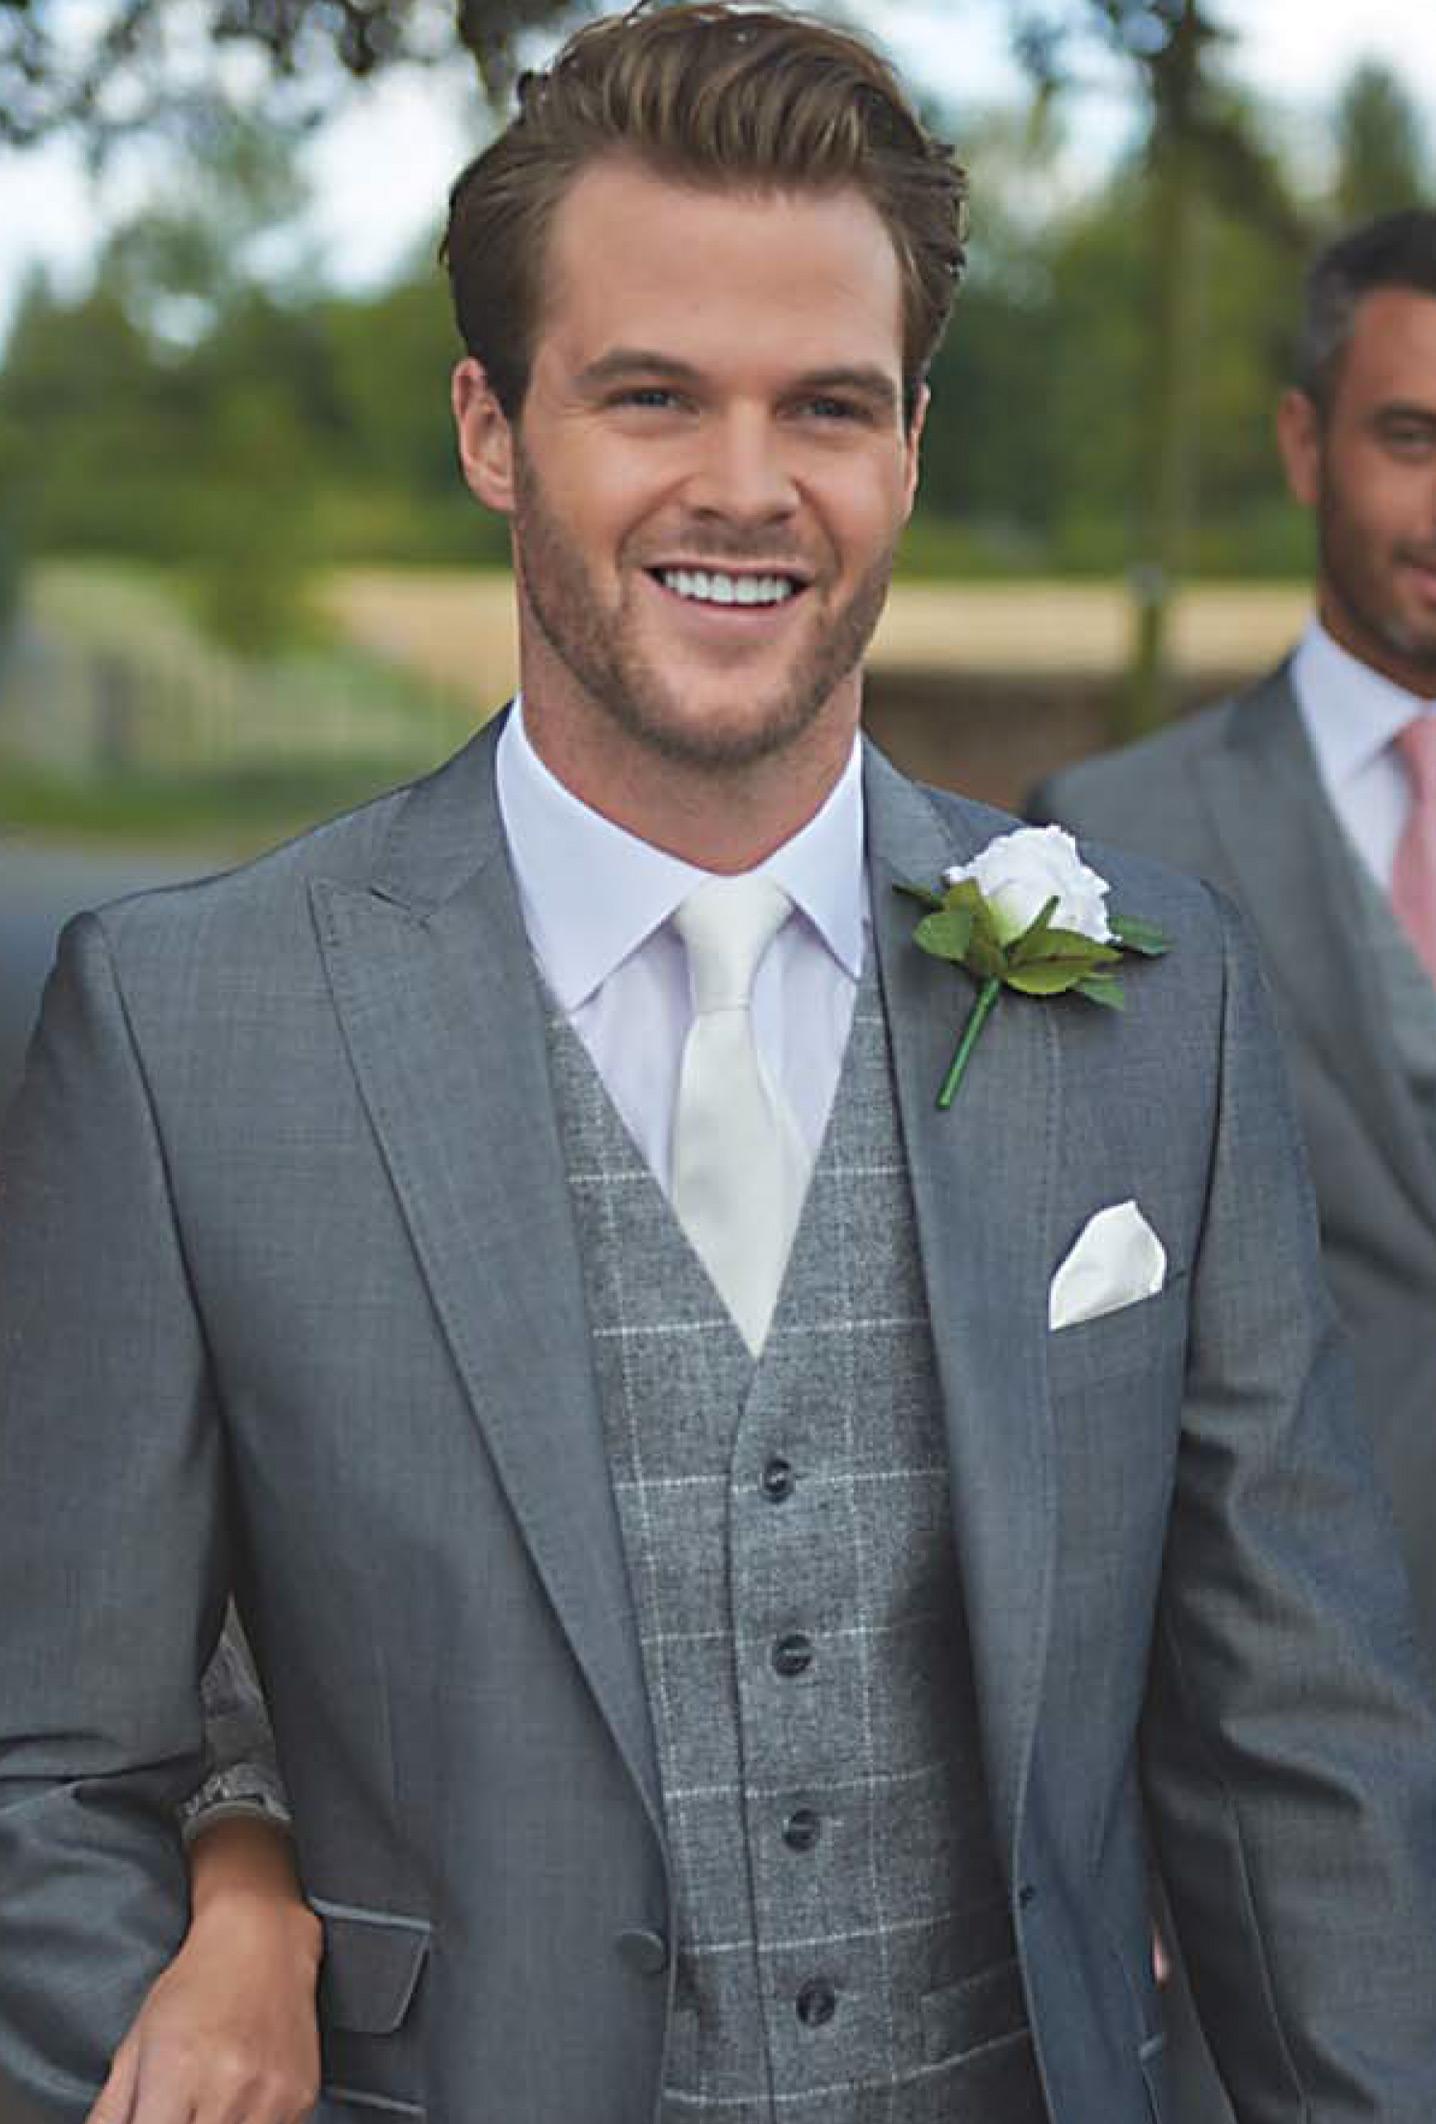 Knighton Wedding Suit Hire